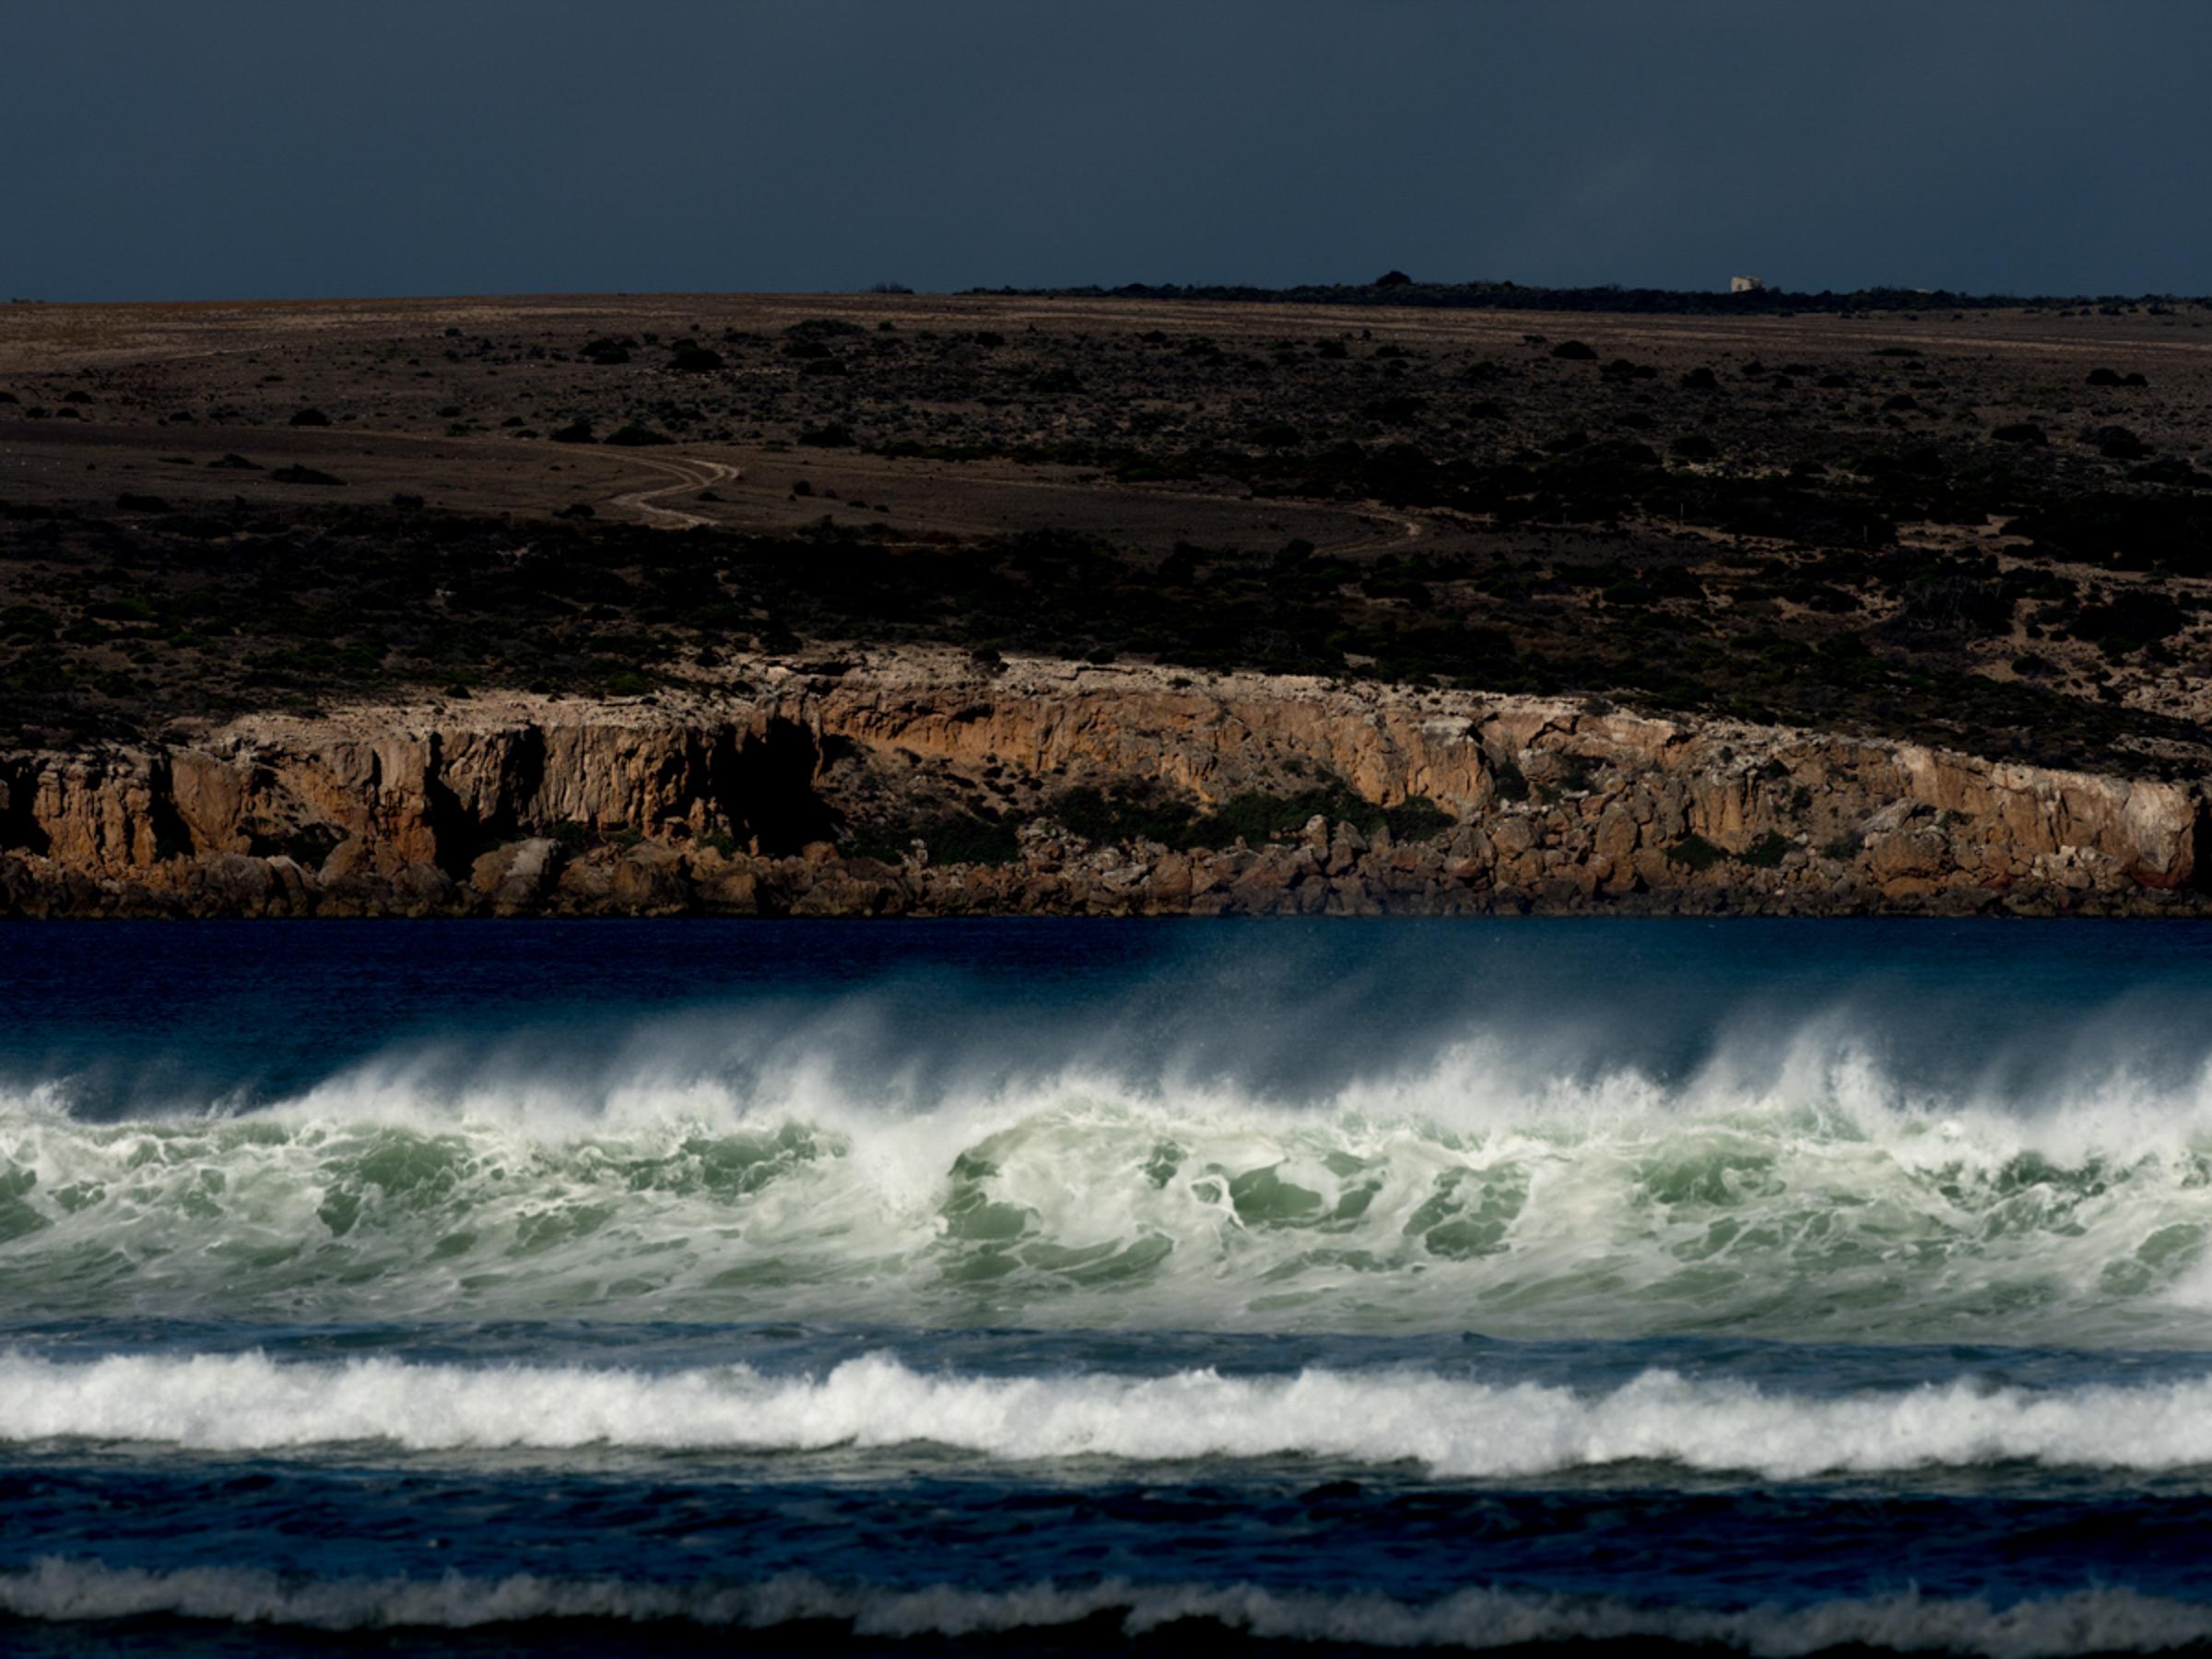 Sceale Bay looking towards Cape Blanche